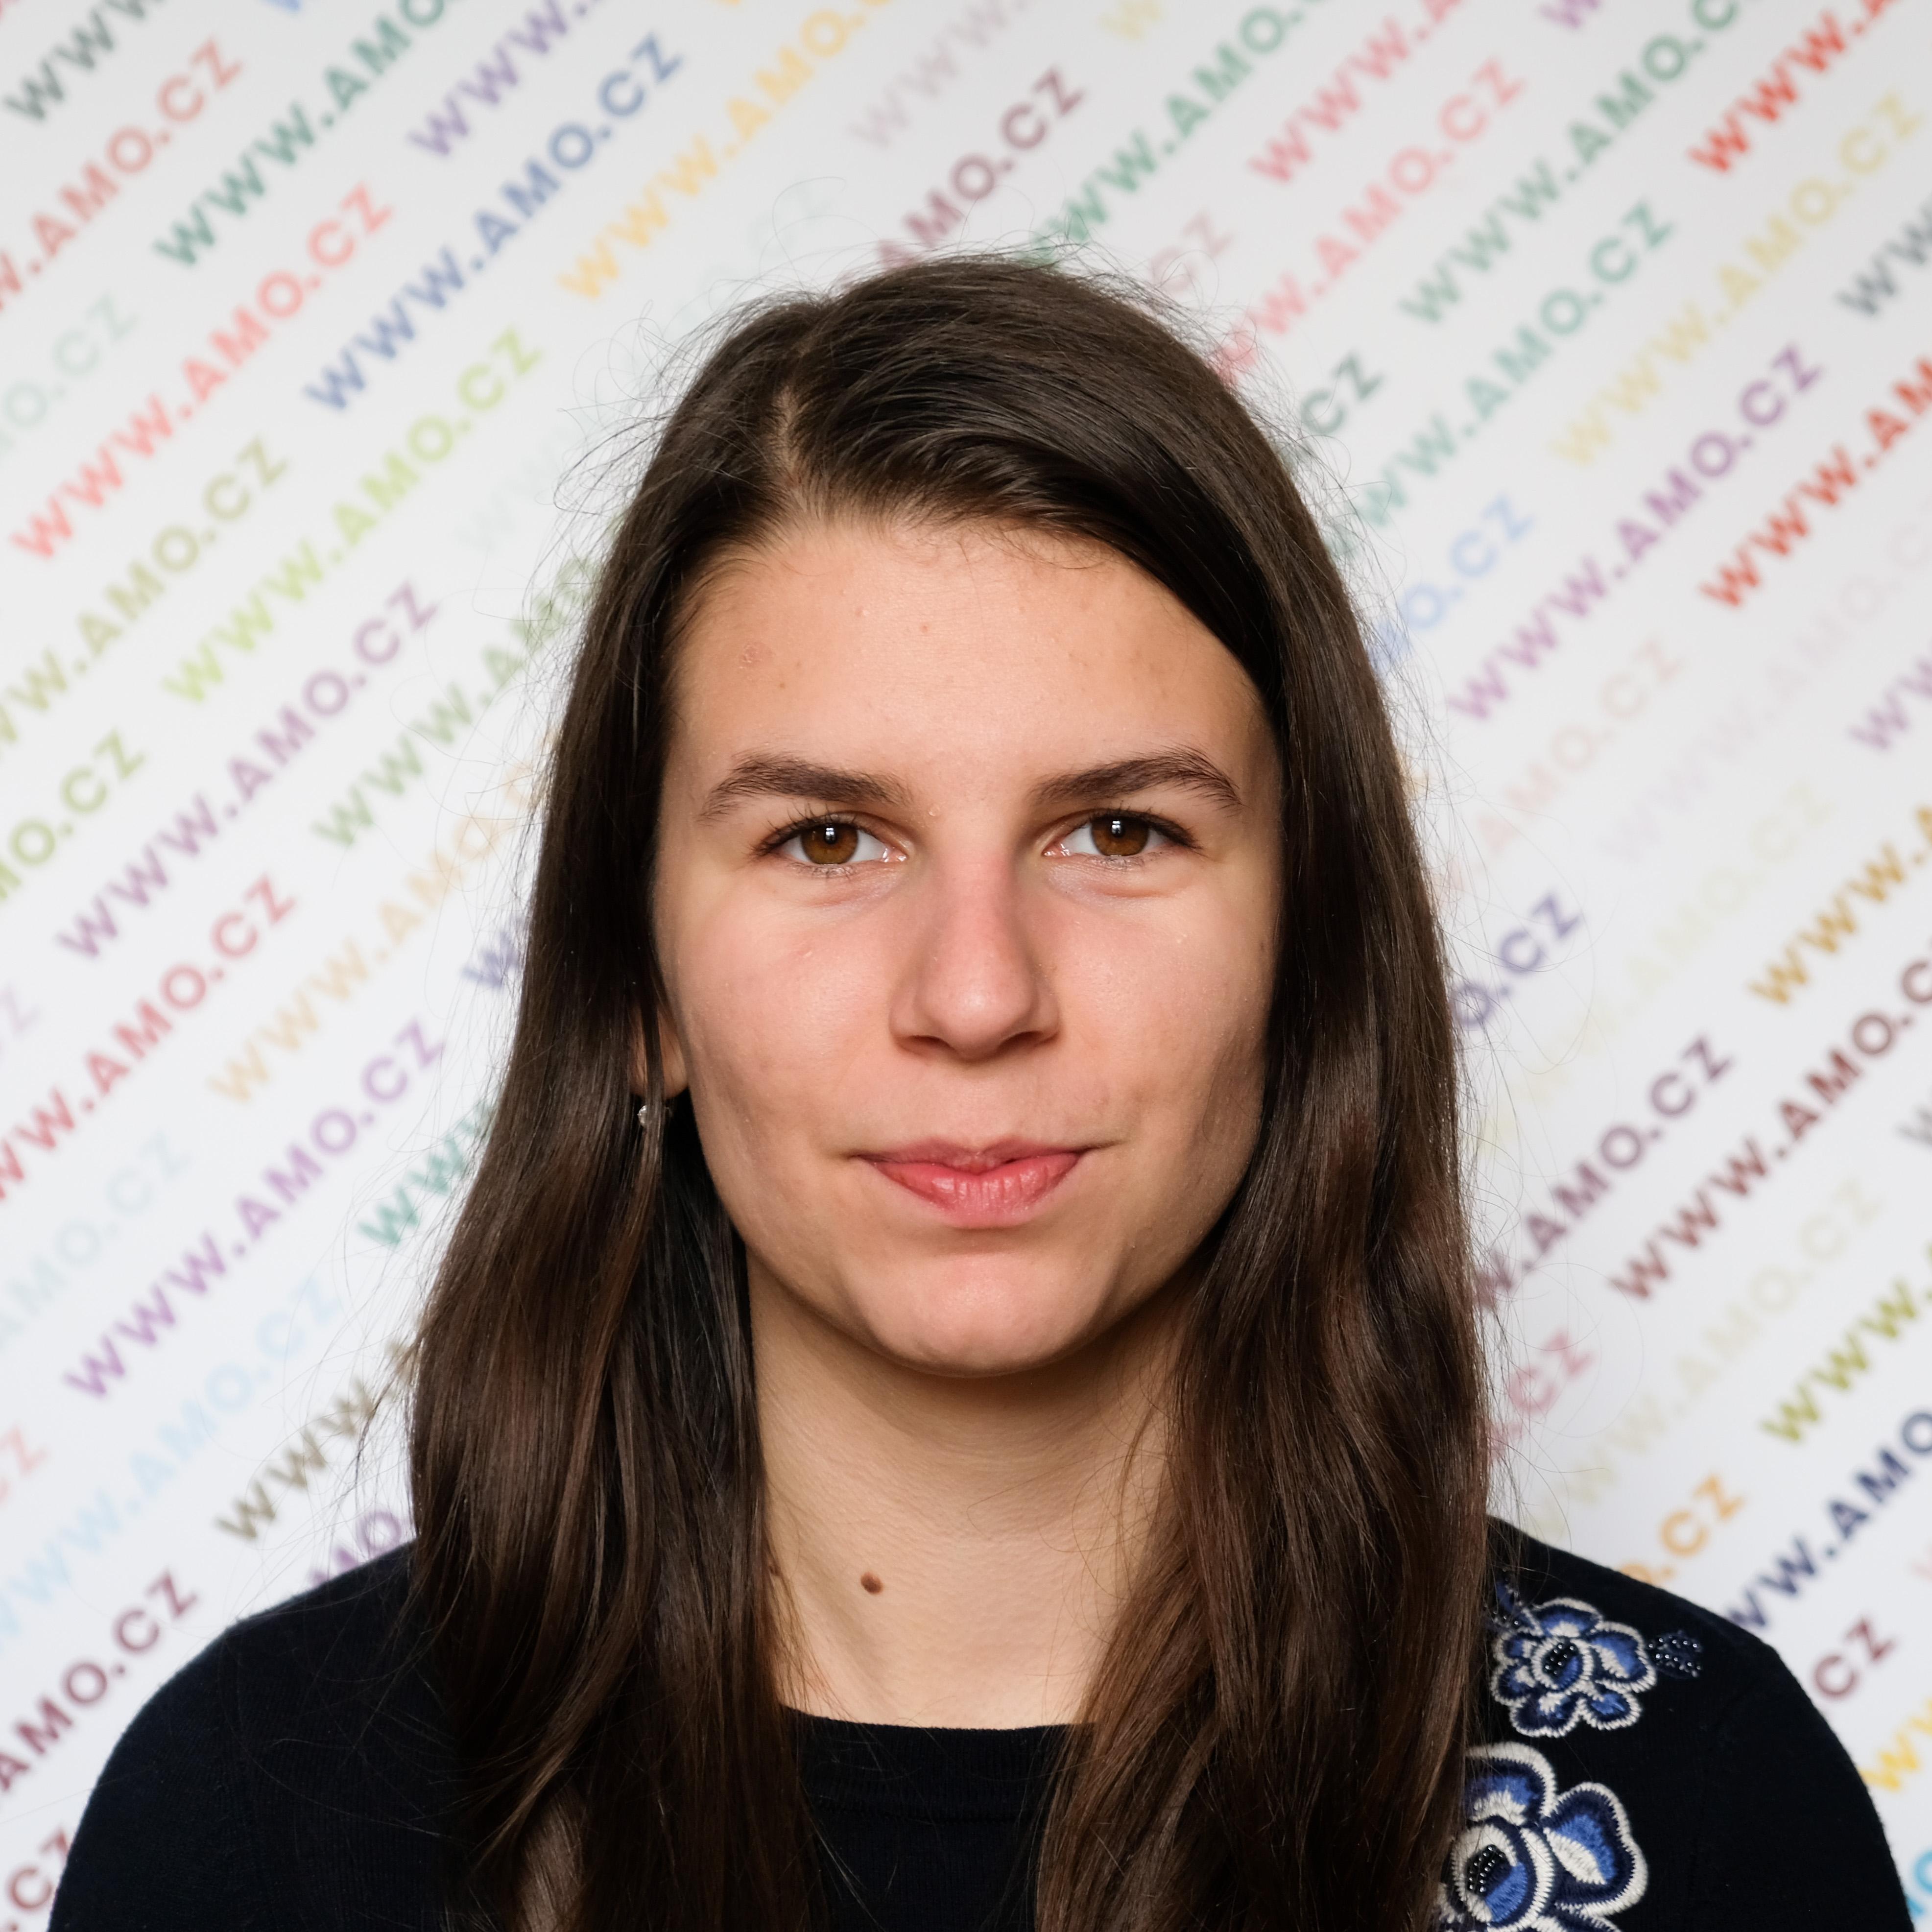 Lucie Vodvářková